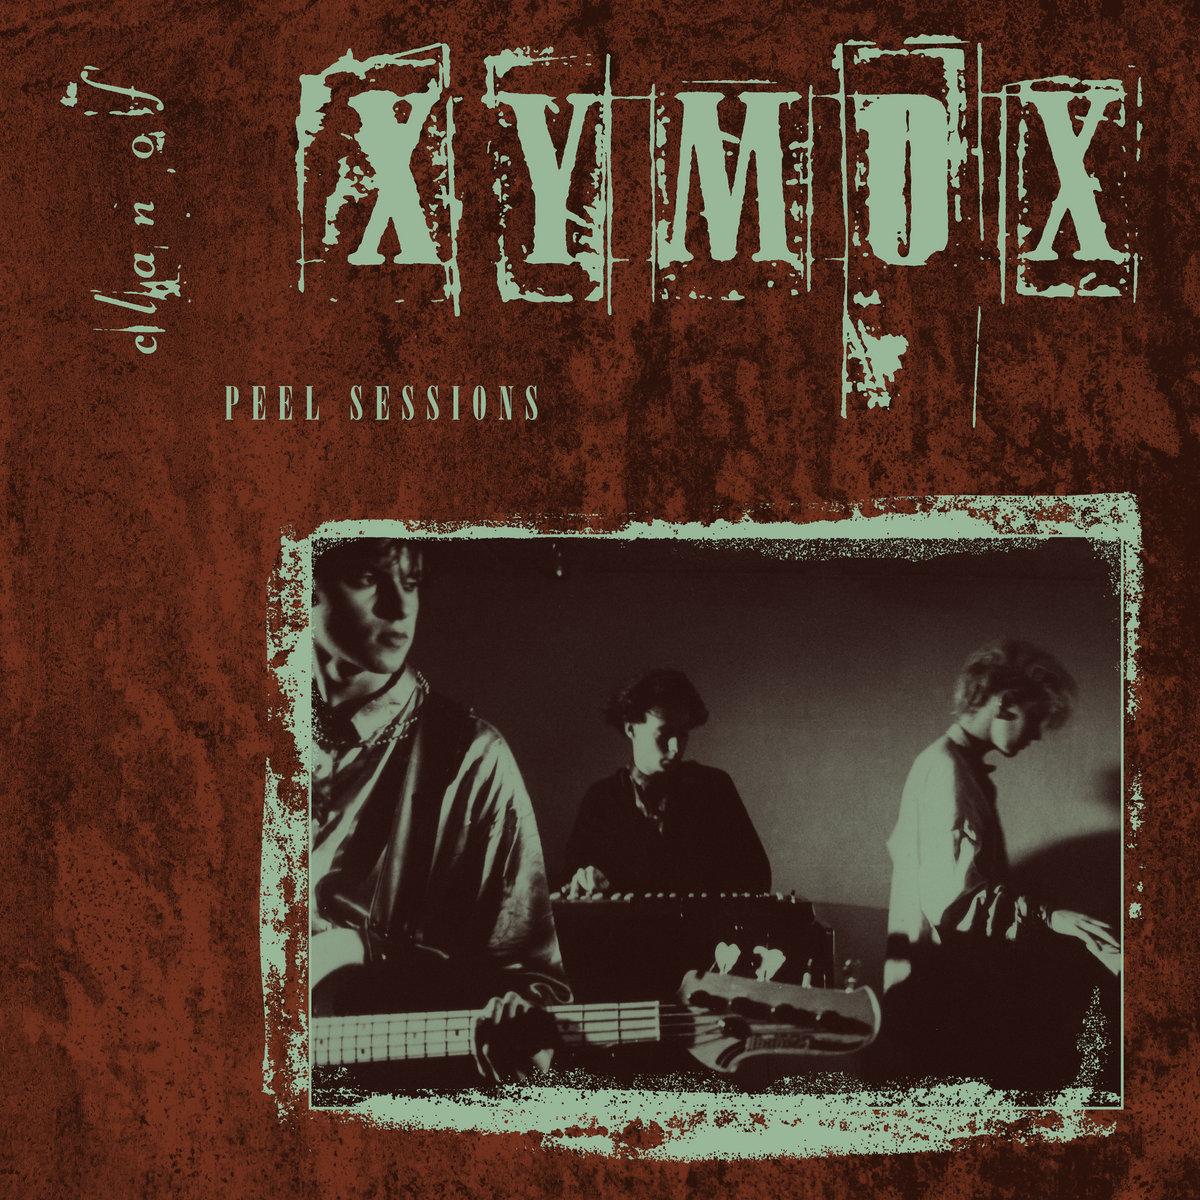 News – Clan of Xymox – Peel Sessions